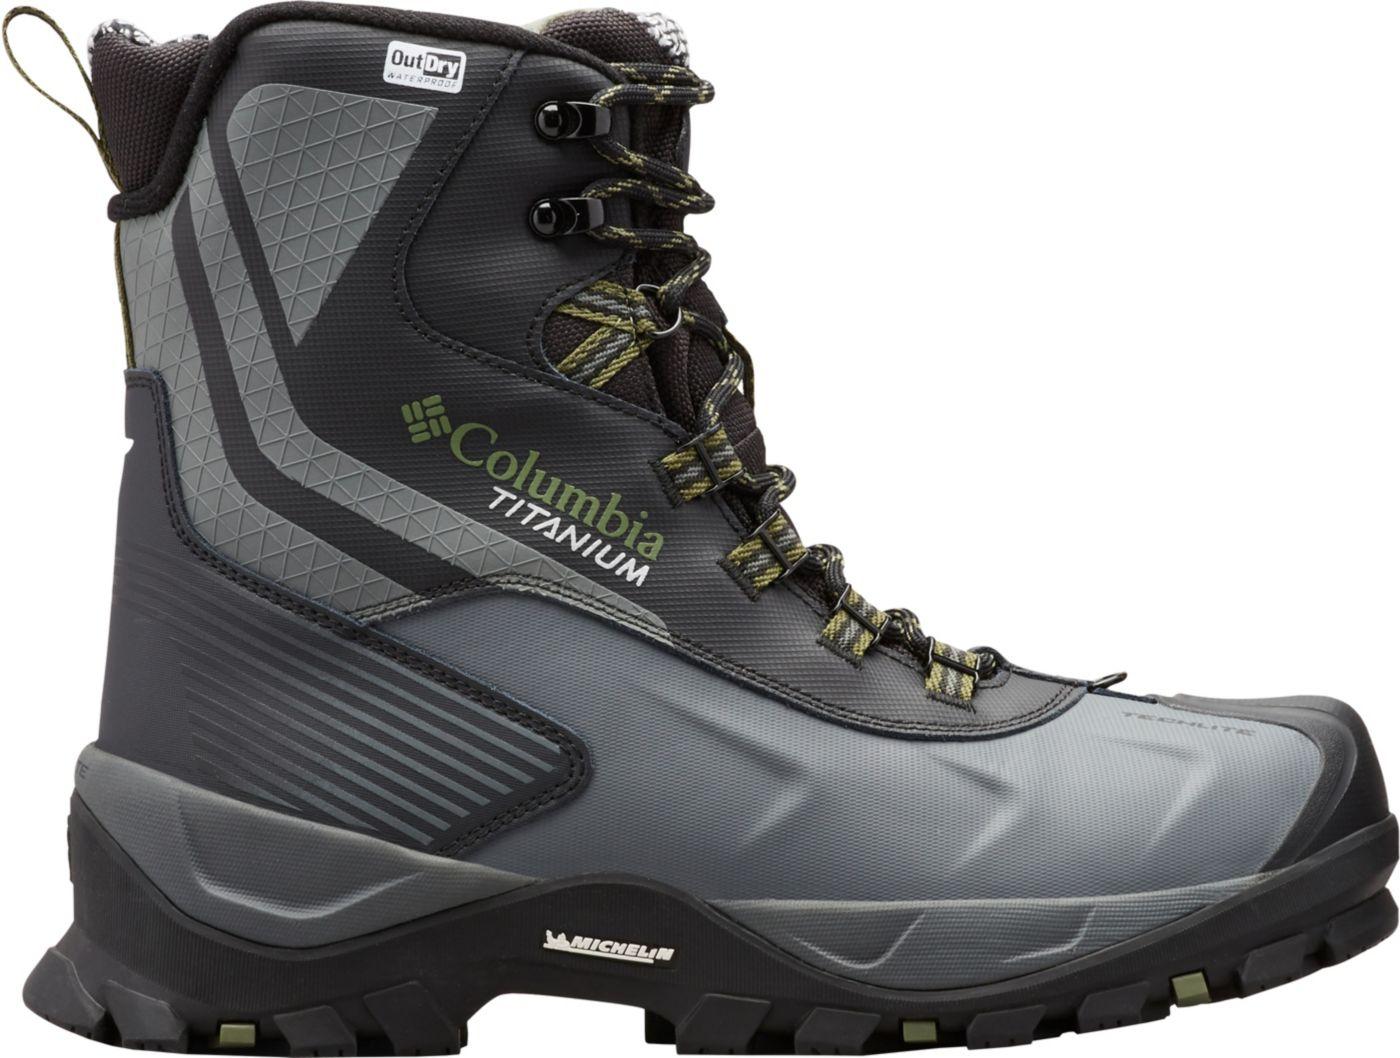 Columbia Men's Powderhouse Titanium Omni-Heat 3D OutDRY 600g Waterproof Winter Boots